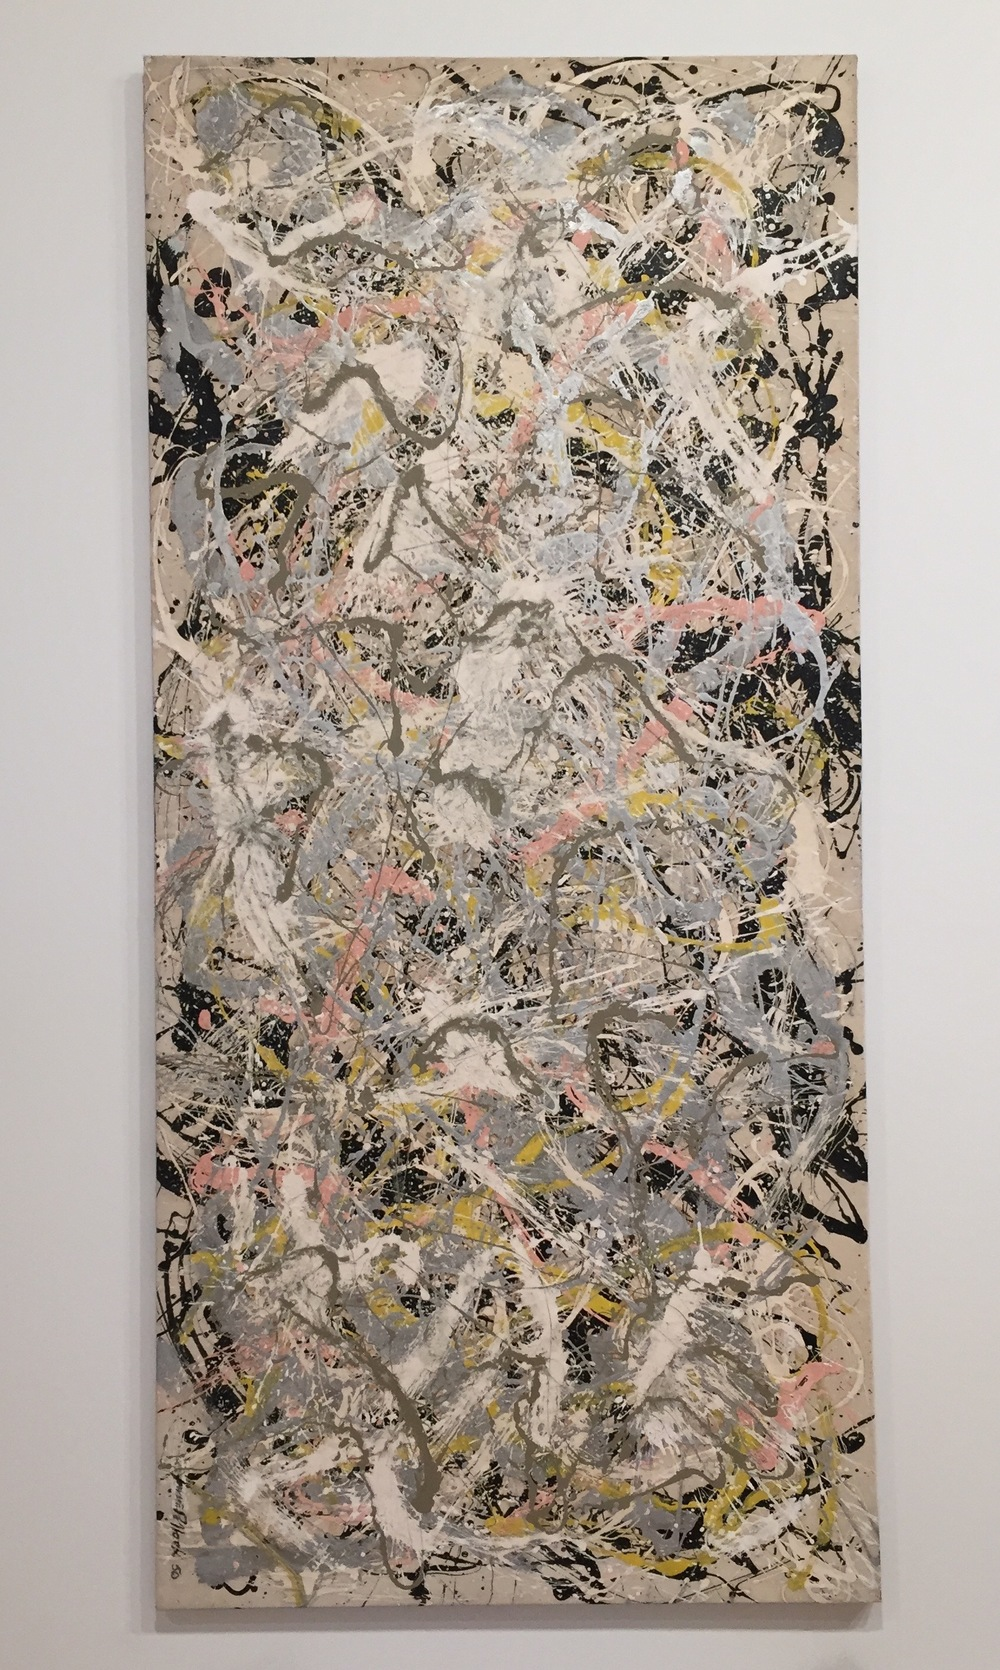 I love me some Jackson Pollock.